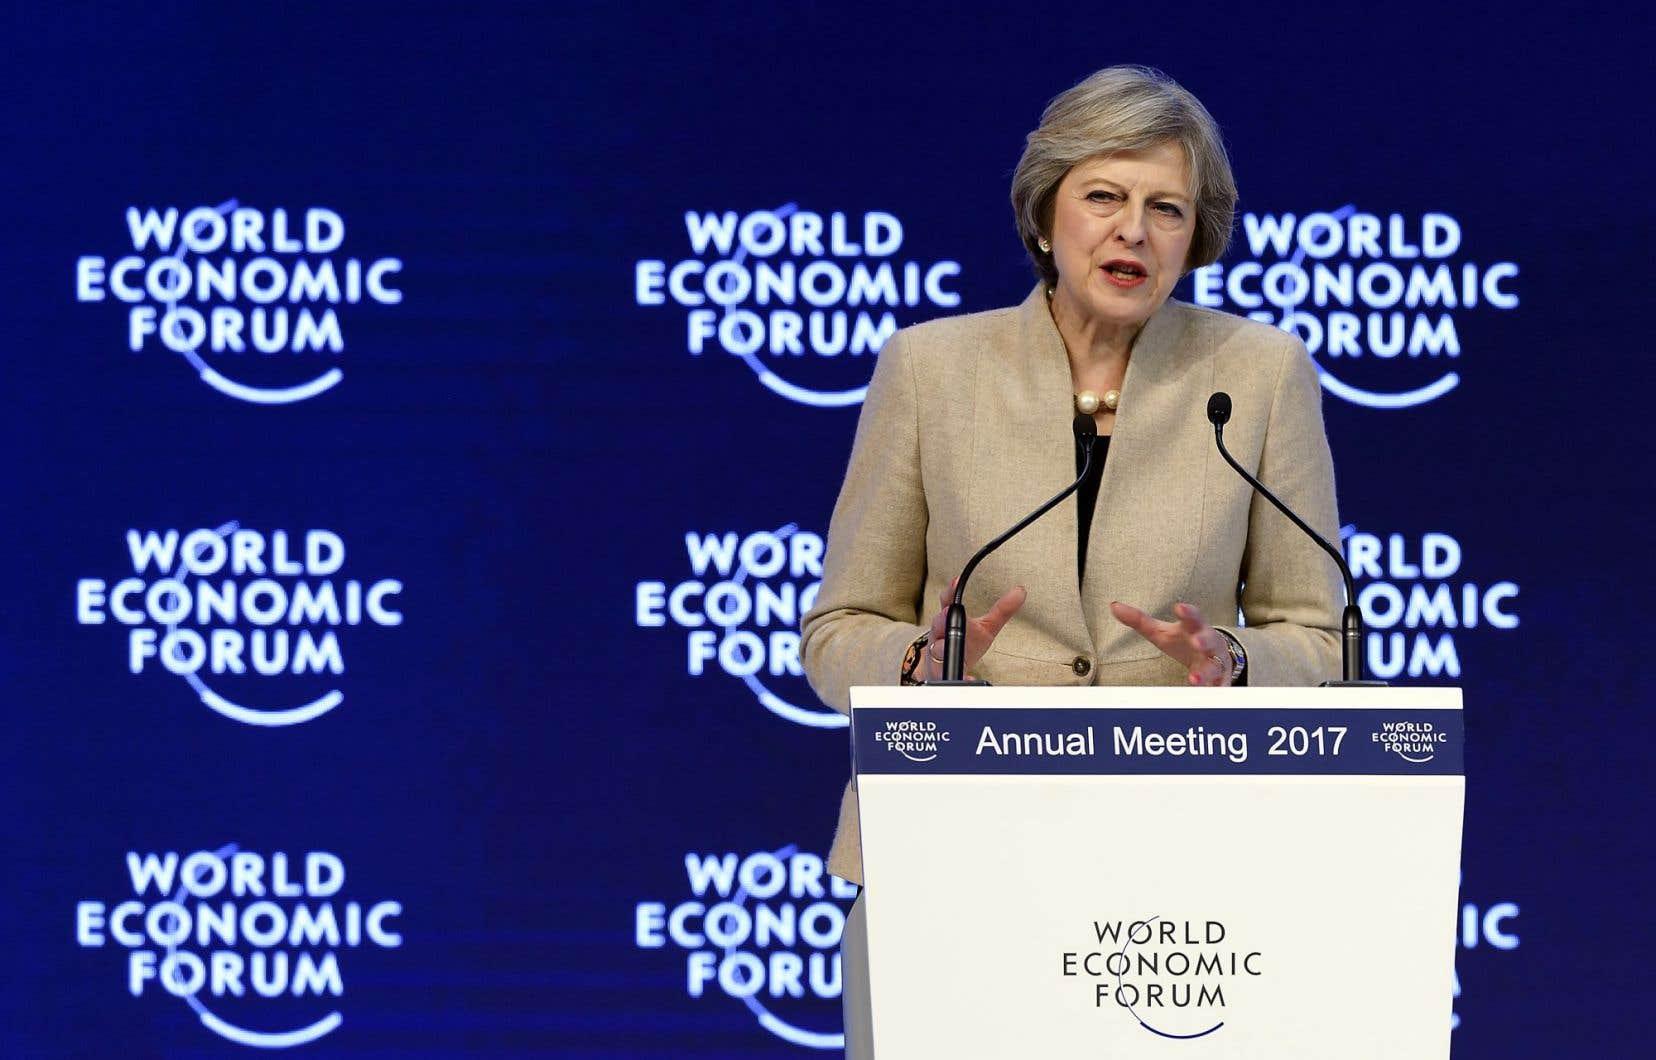 La première ministre du Royaume-Uni, Theresa May